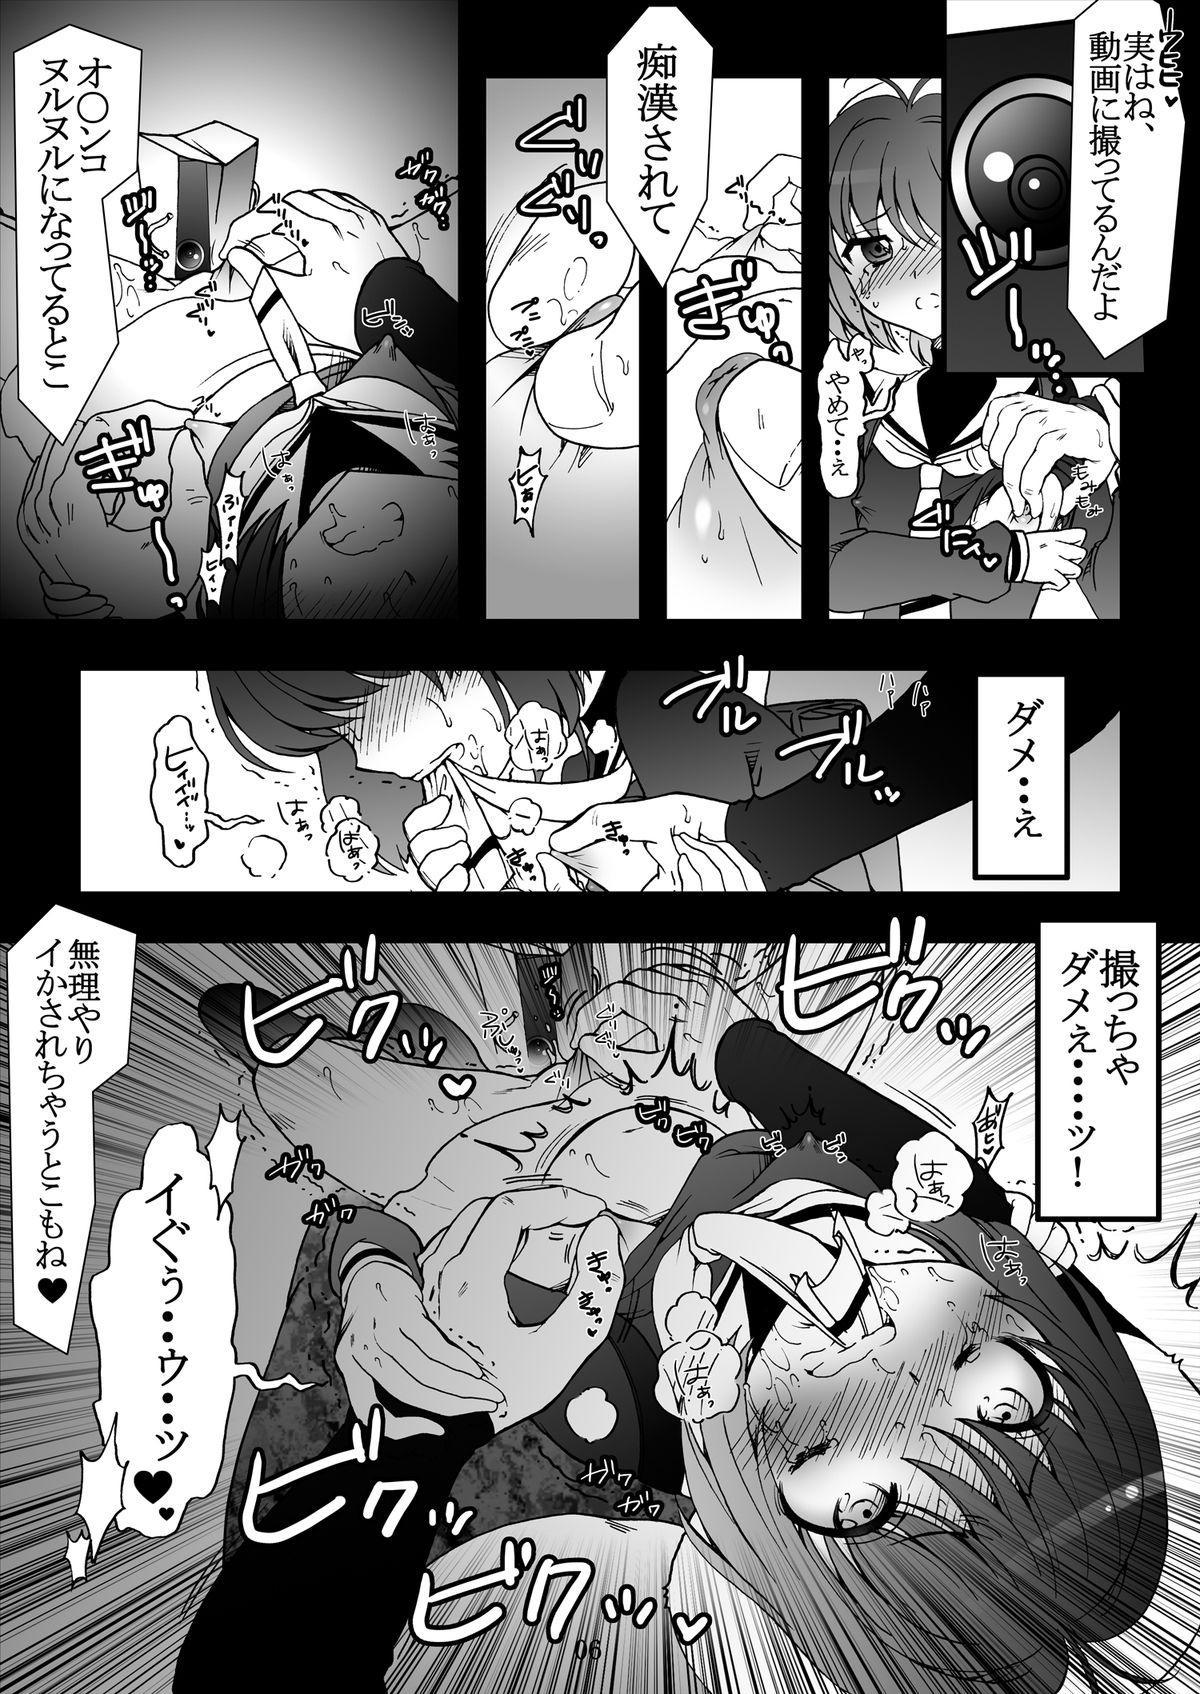 Sakura Slave to the Grind 5